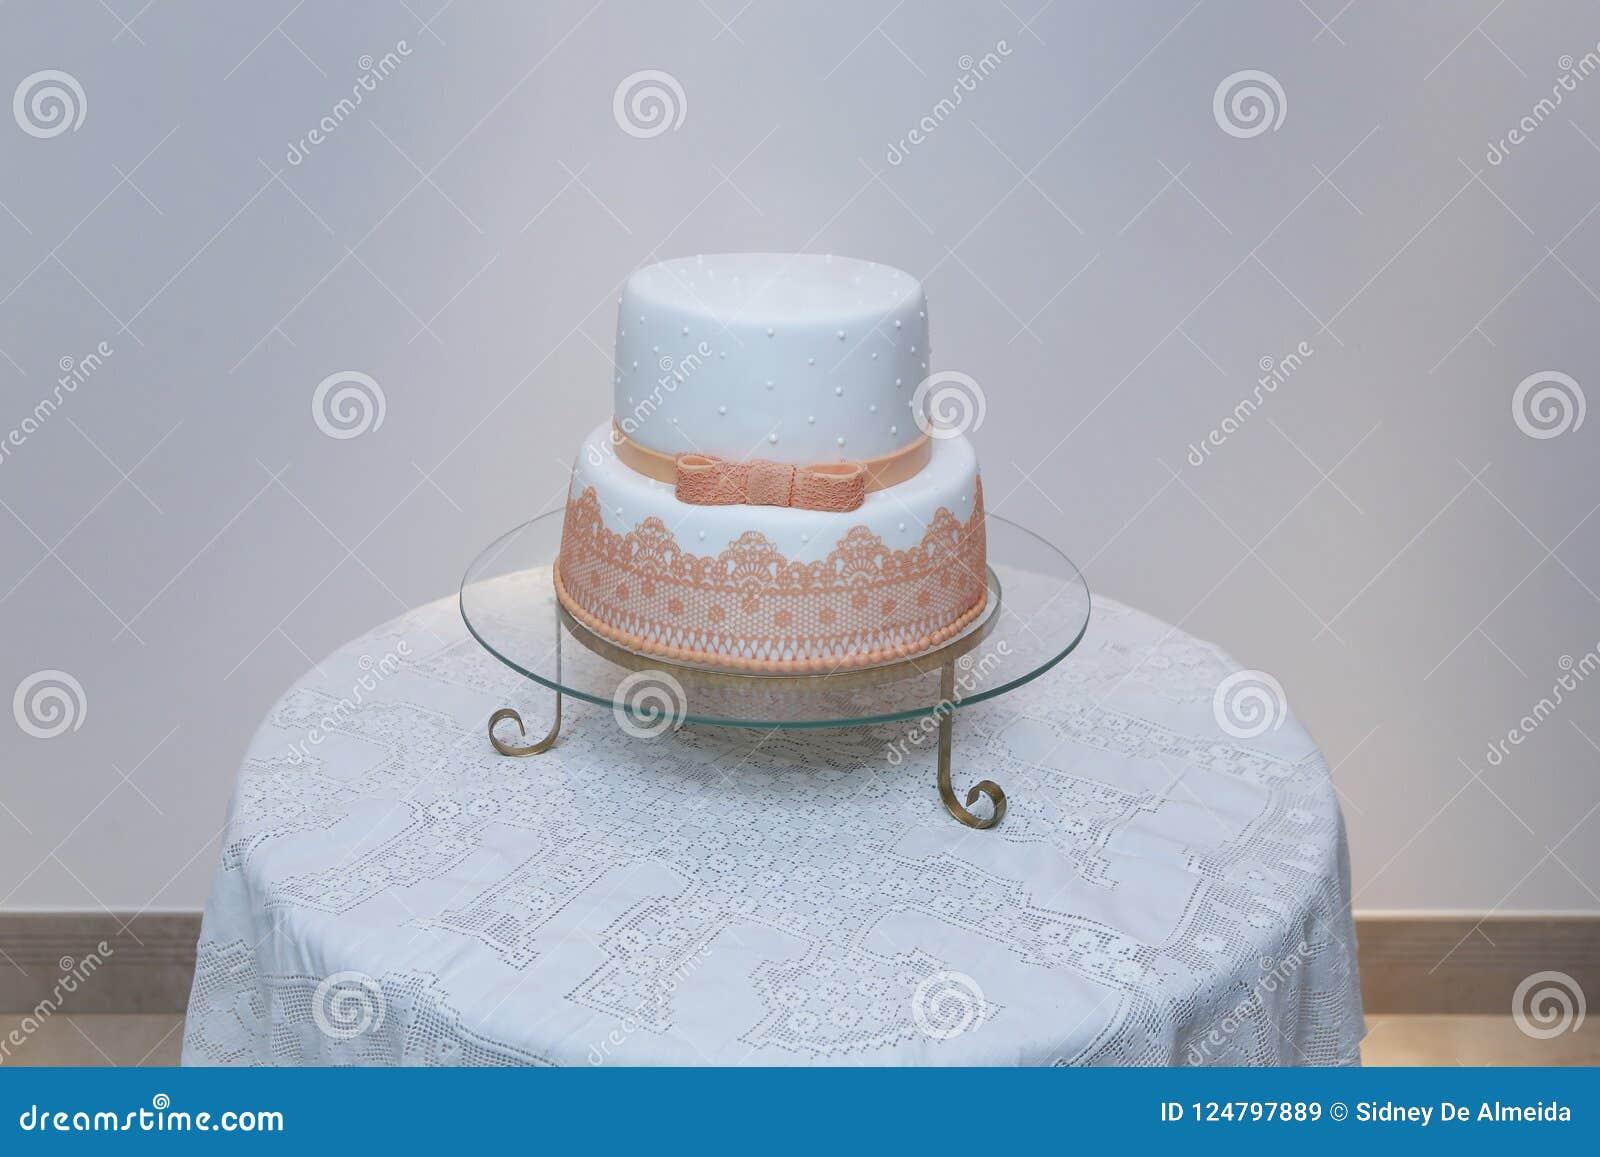 Elegant Birthday Cake With Orange Color Detail Stock Image Image